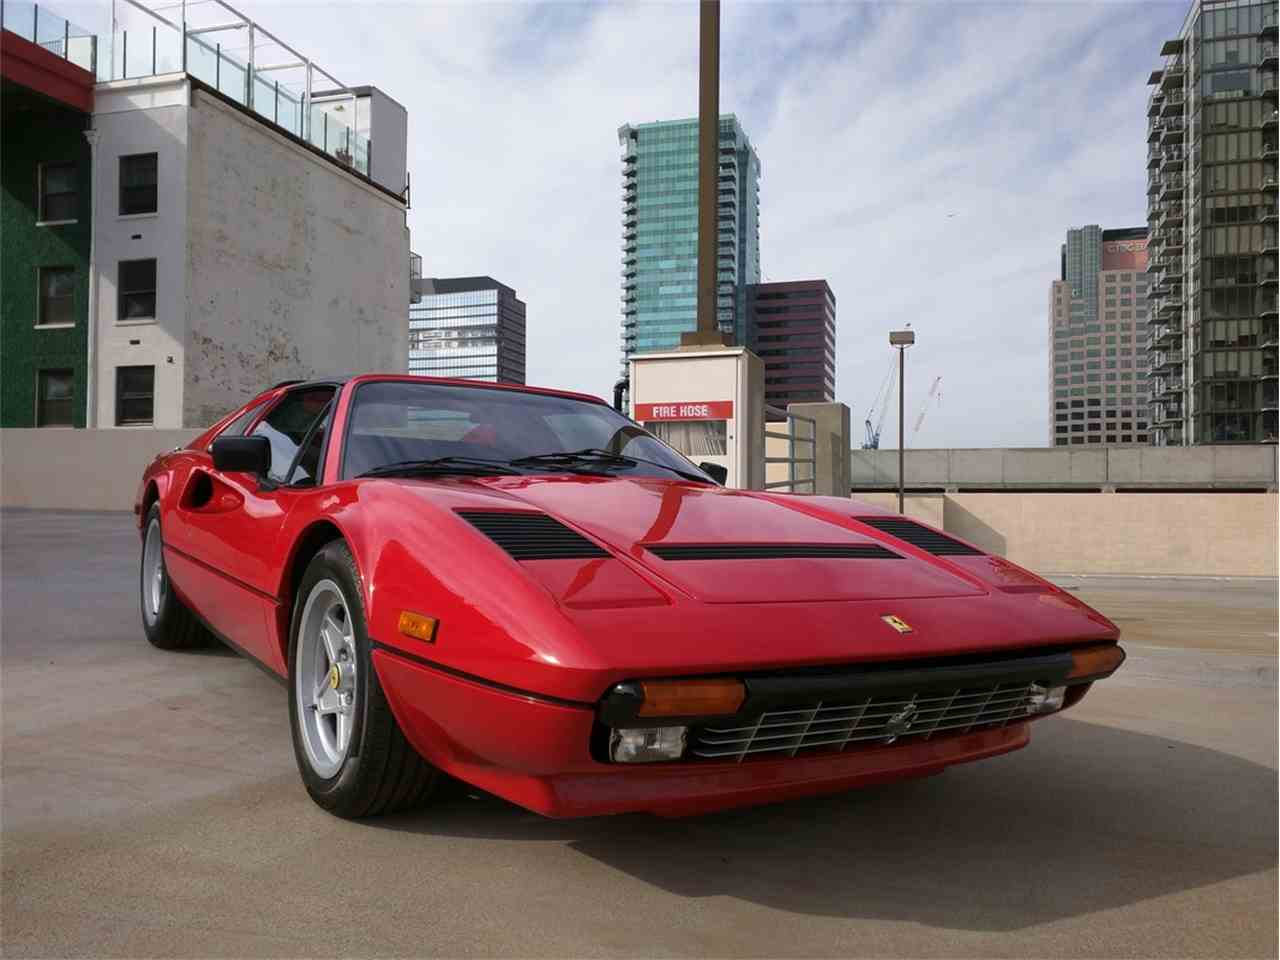 Large Picture of '85 Ferrari 308 GTS located in California - $60,000.00 - G99N